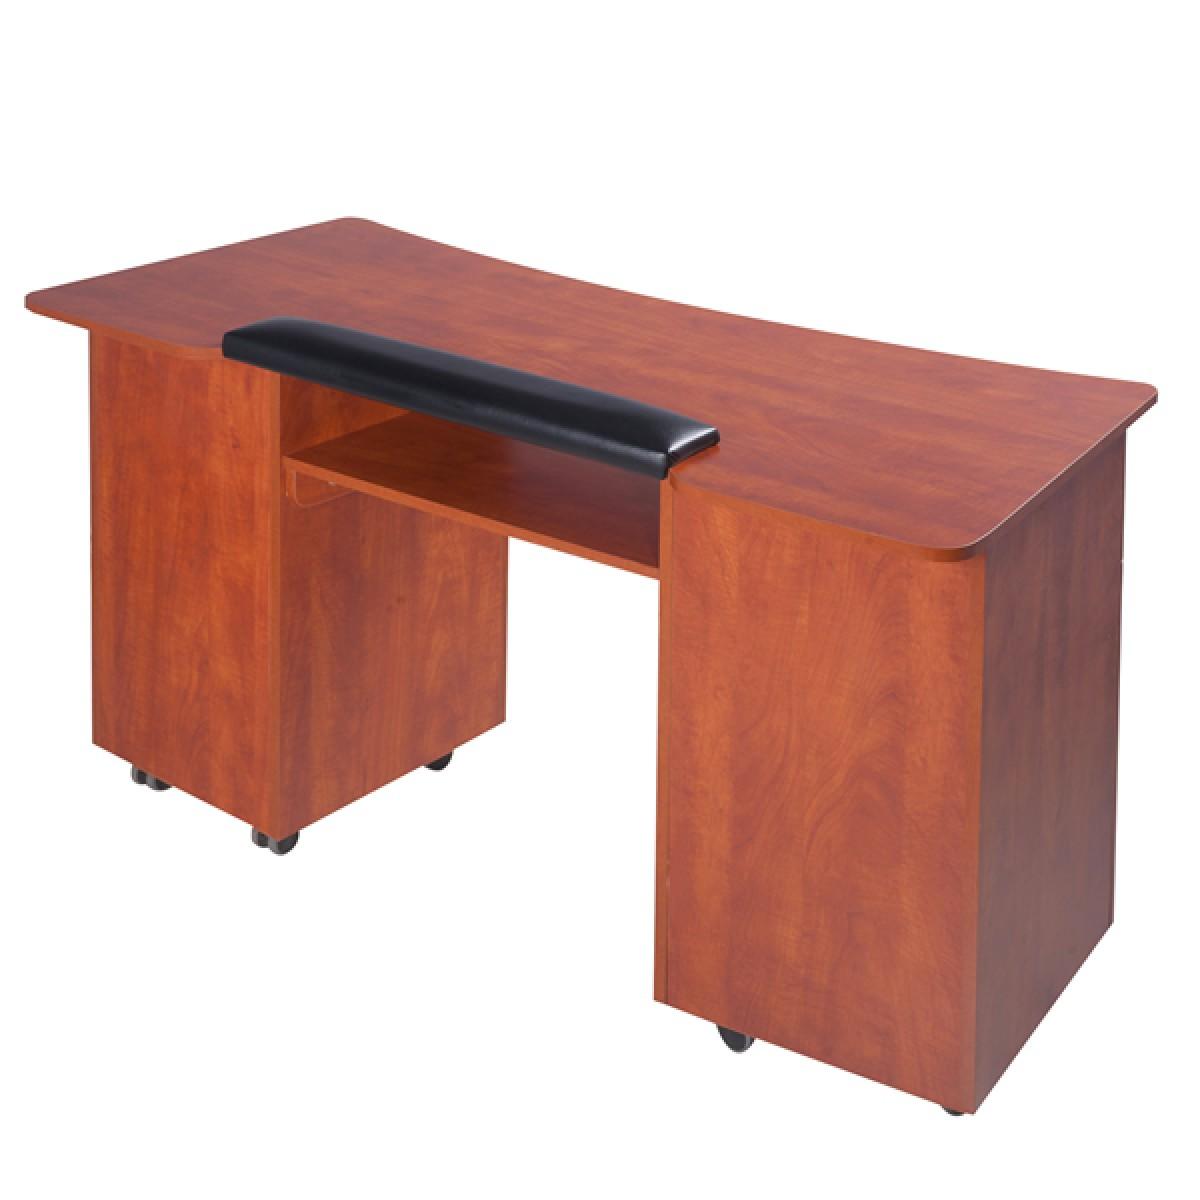 armoy manicure table sale. Black Bedroom Furniture Sets. Home Design Ideas